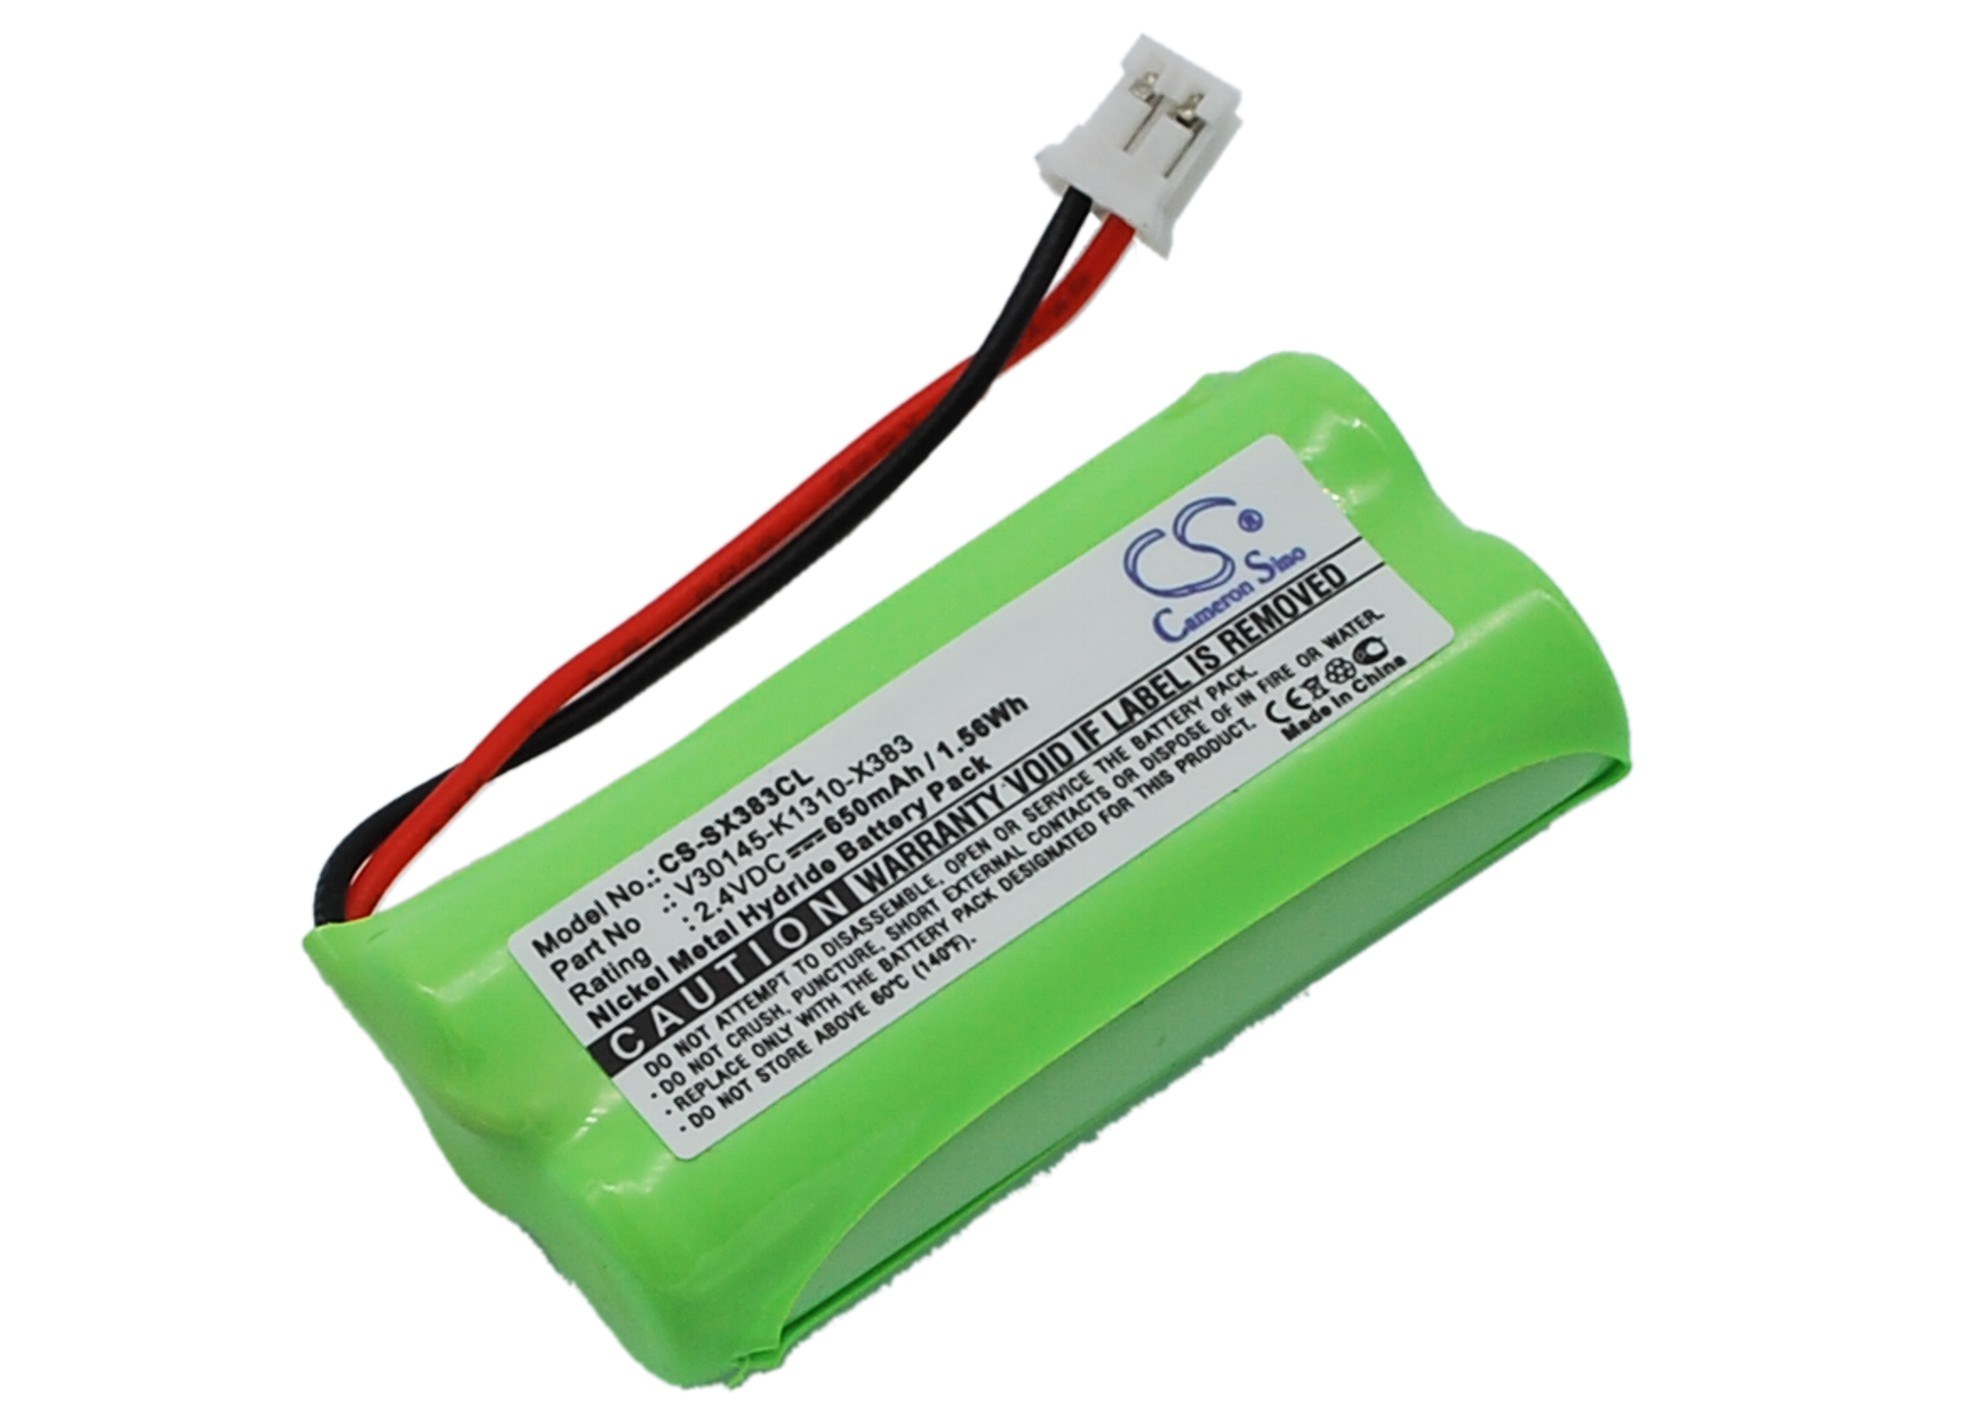 Cameron Sino baterie do bezdrátových telefonů pro SIEMENS Gigaset AS150 2.4V Ni-MH 650mAh černá - neoriginální